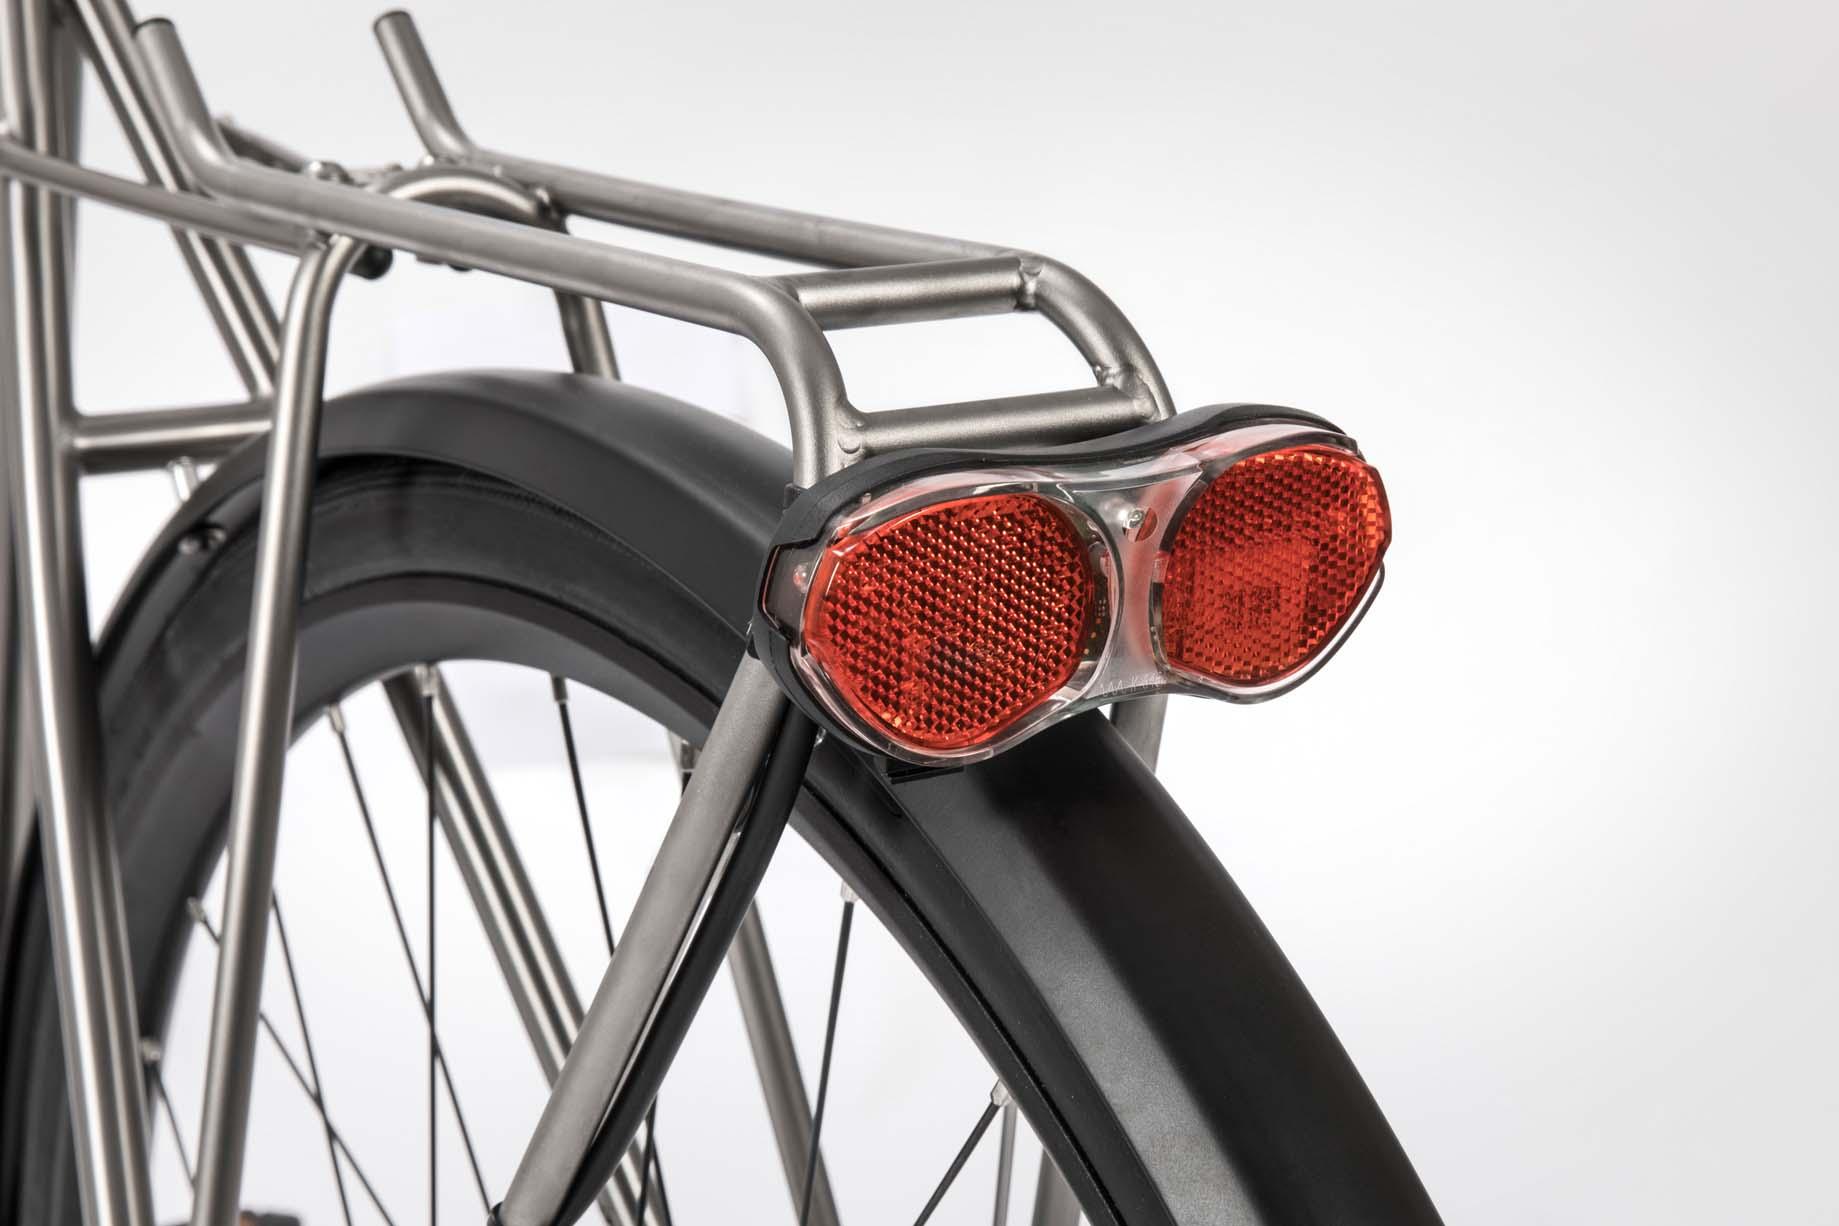 Pinion Urban Bike